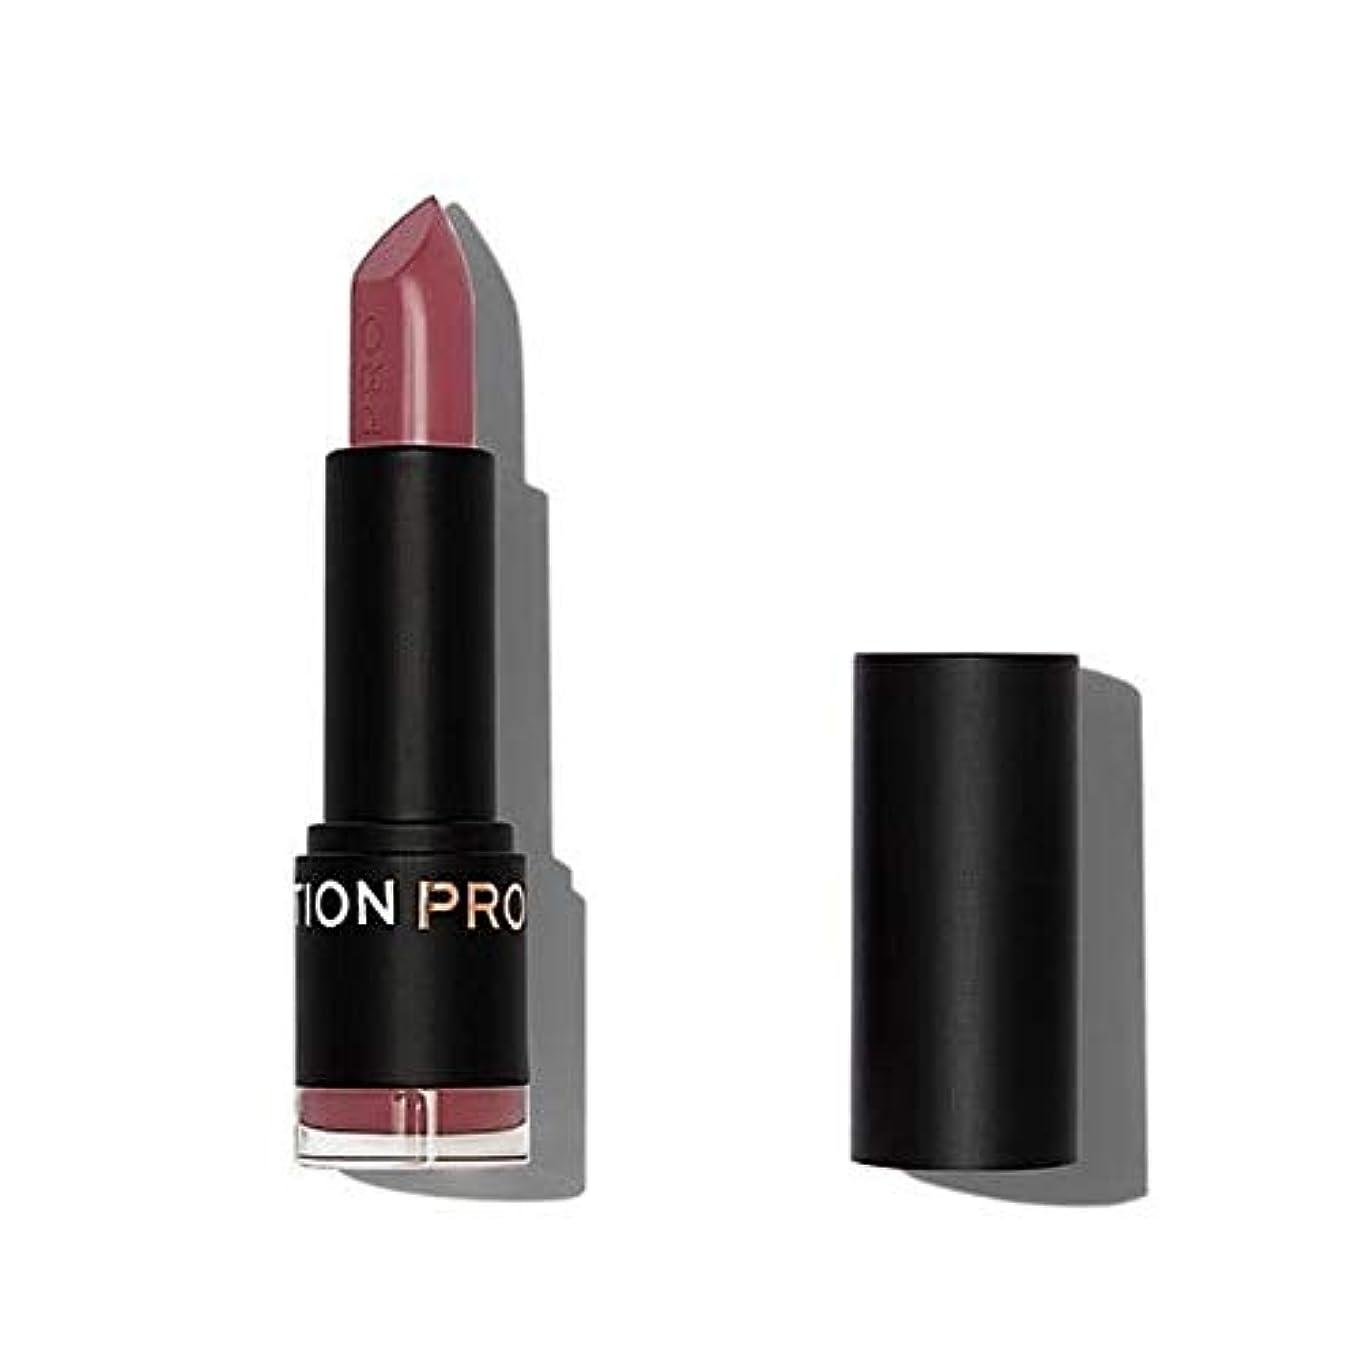 [Revolution ] 革命プロ最高の口紅の火付け役 - Revolution Pro Supreme Lipstick Instigator [並行輸入品]